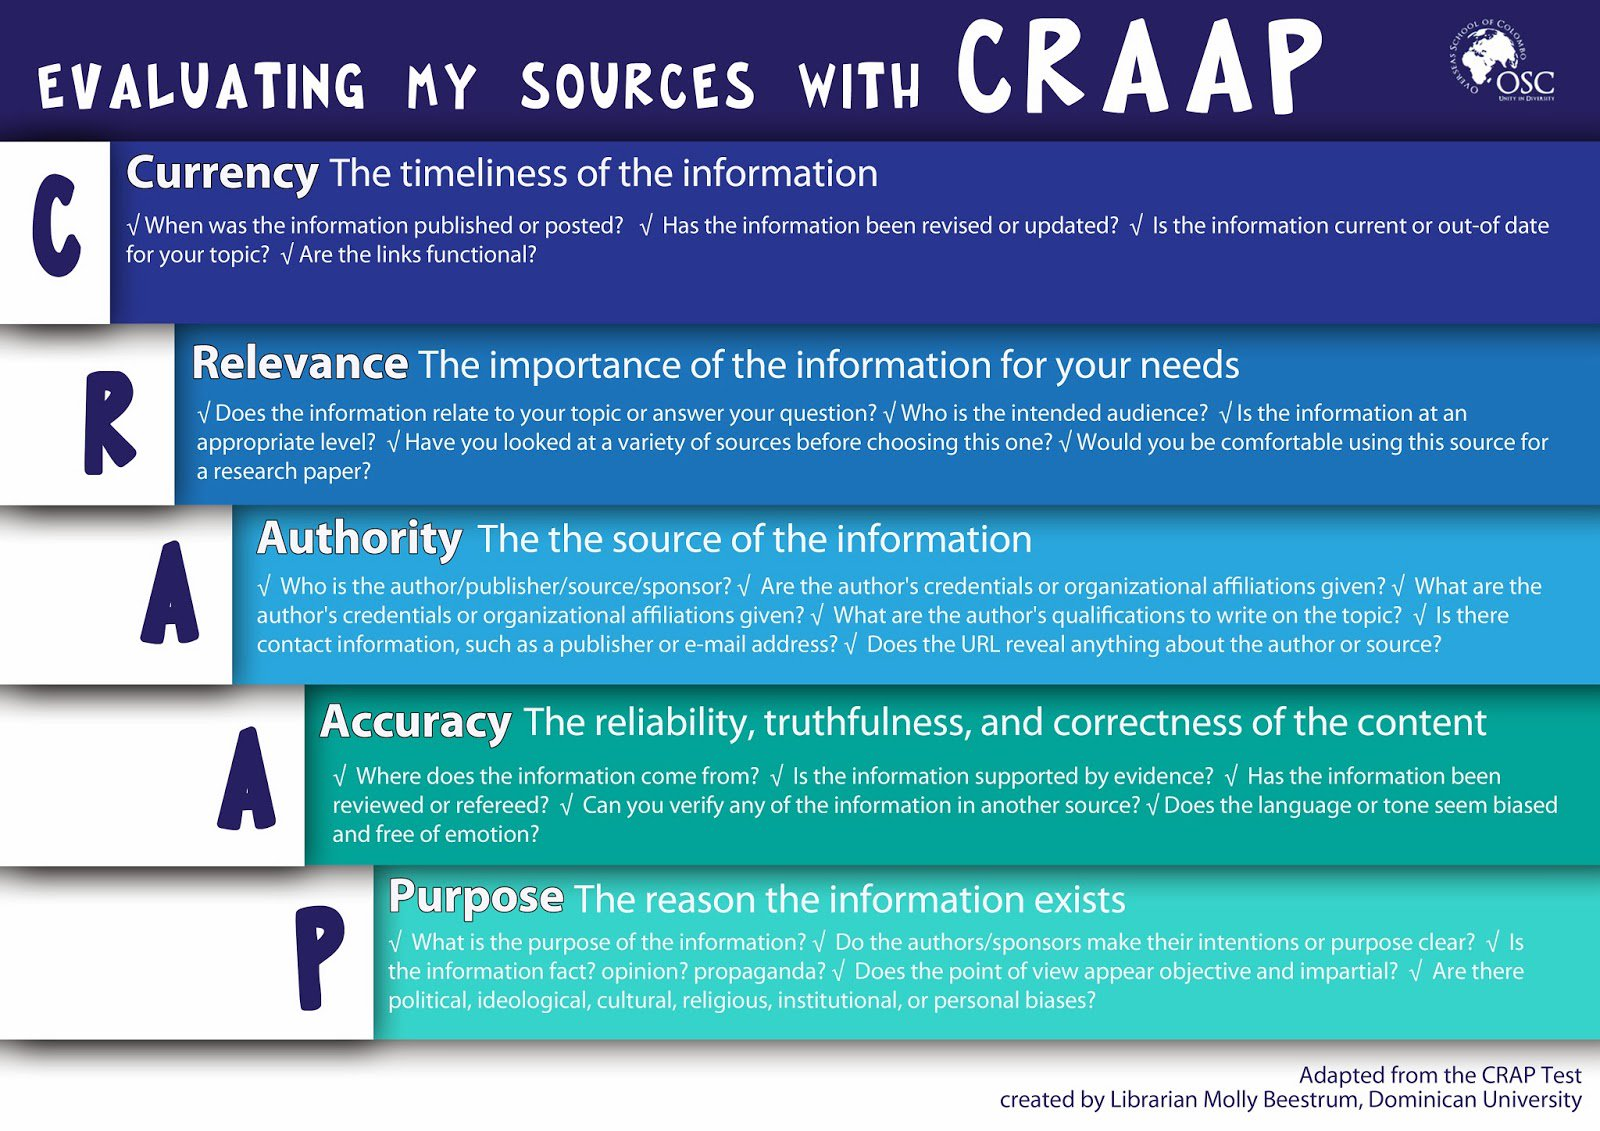 Evaluate online information using the CRAAP test. #redhilltech #edtech https://t.co/aijxCZ2TJJ